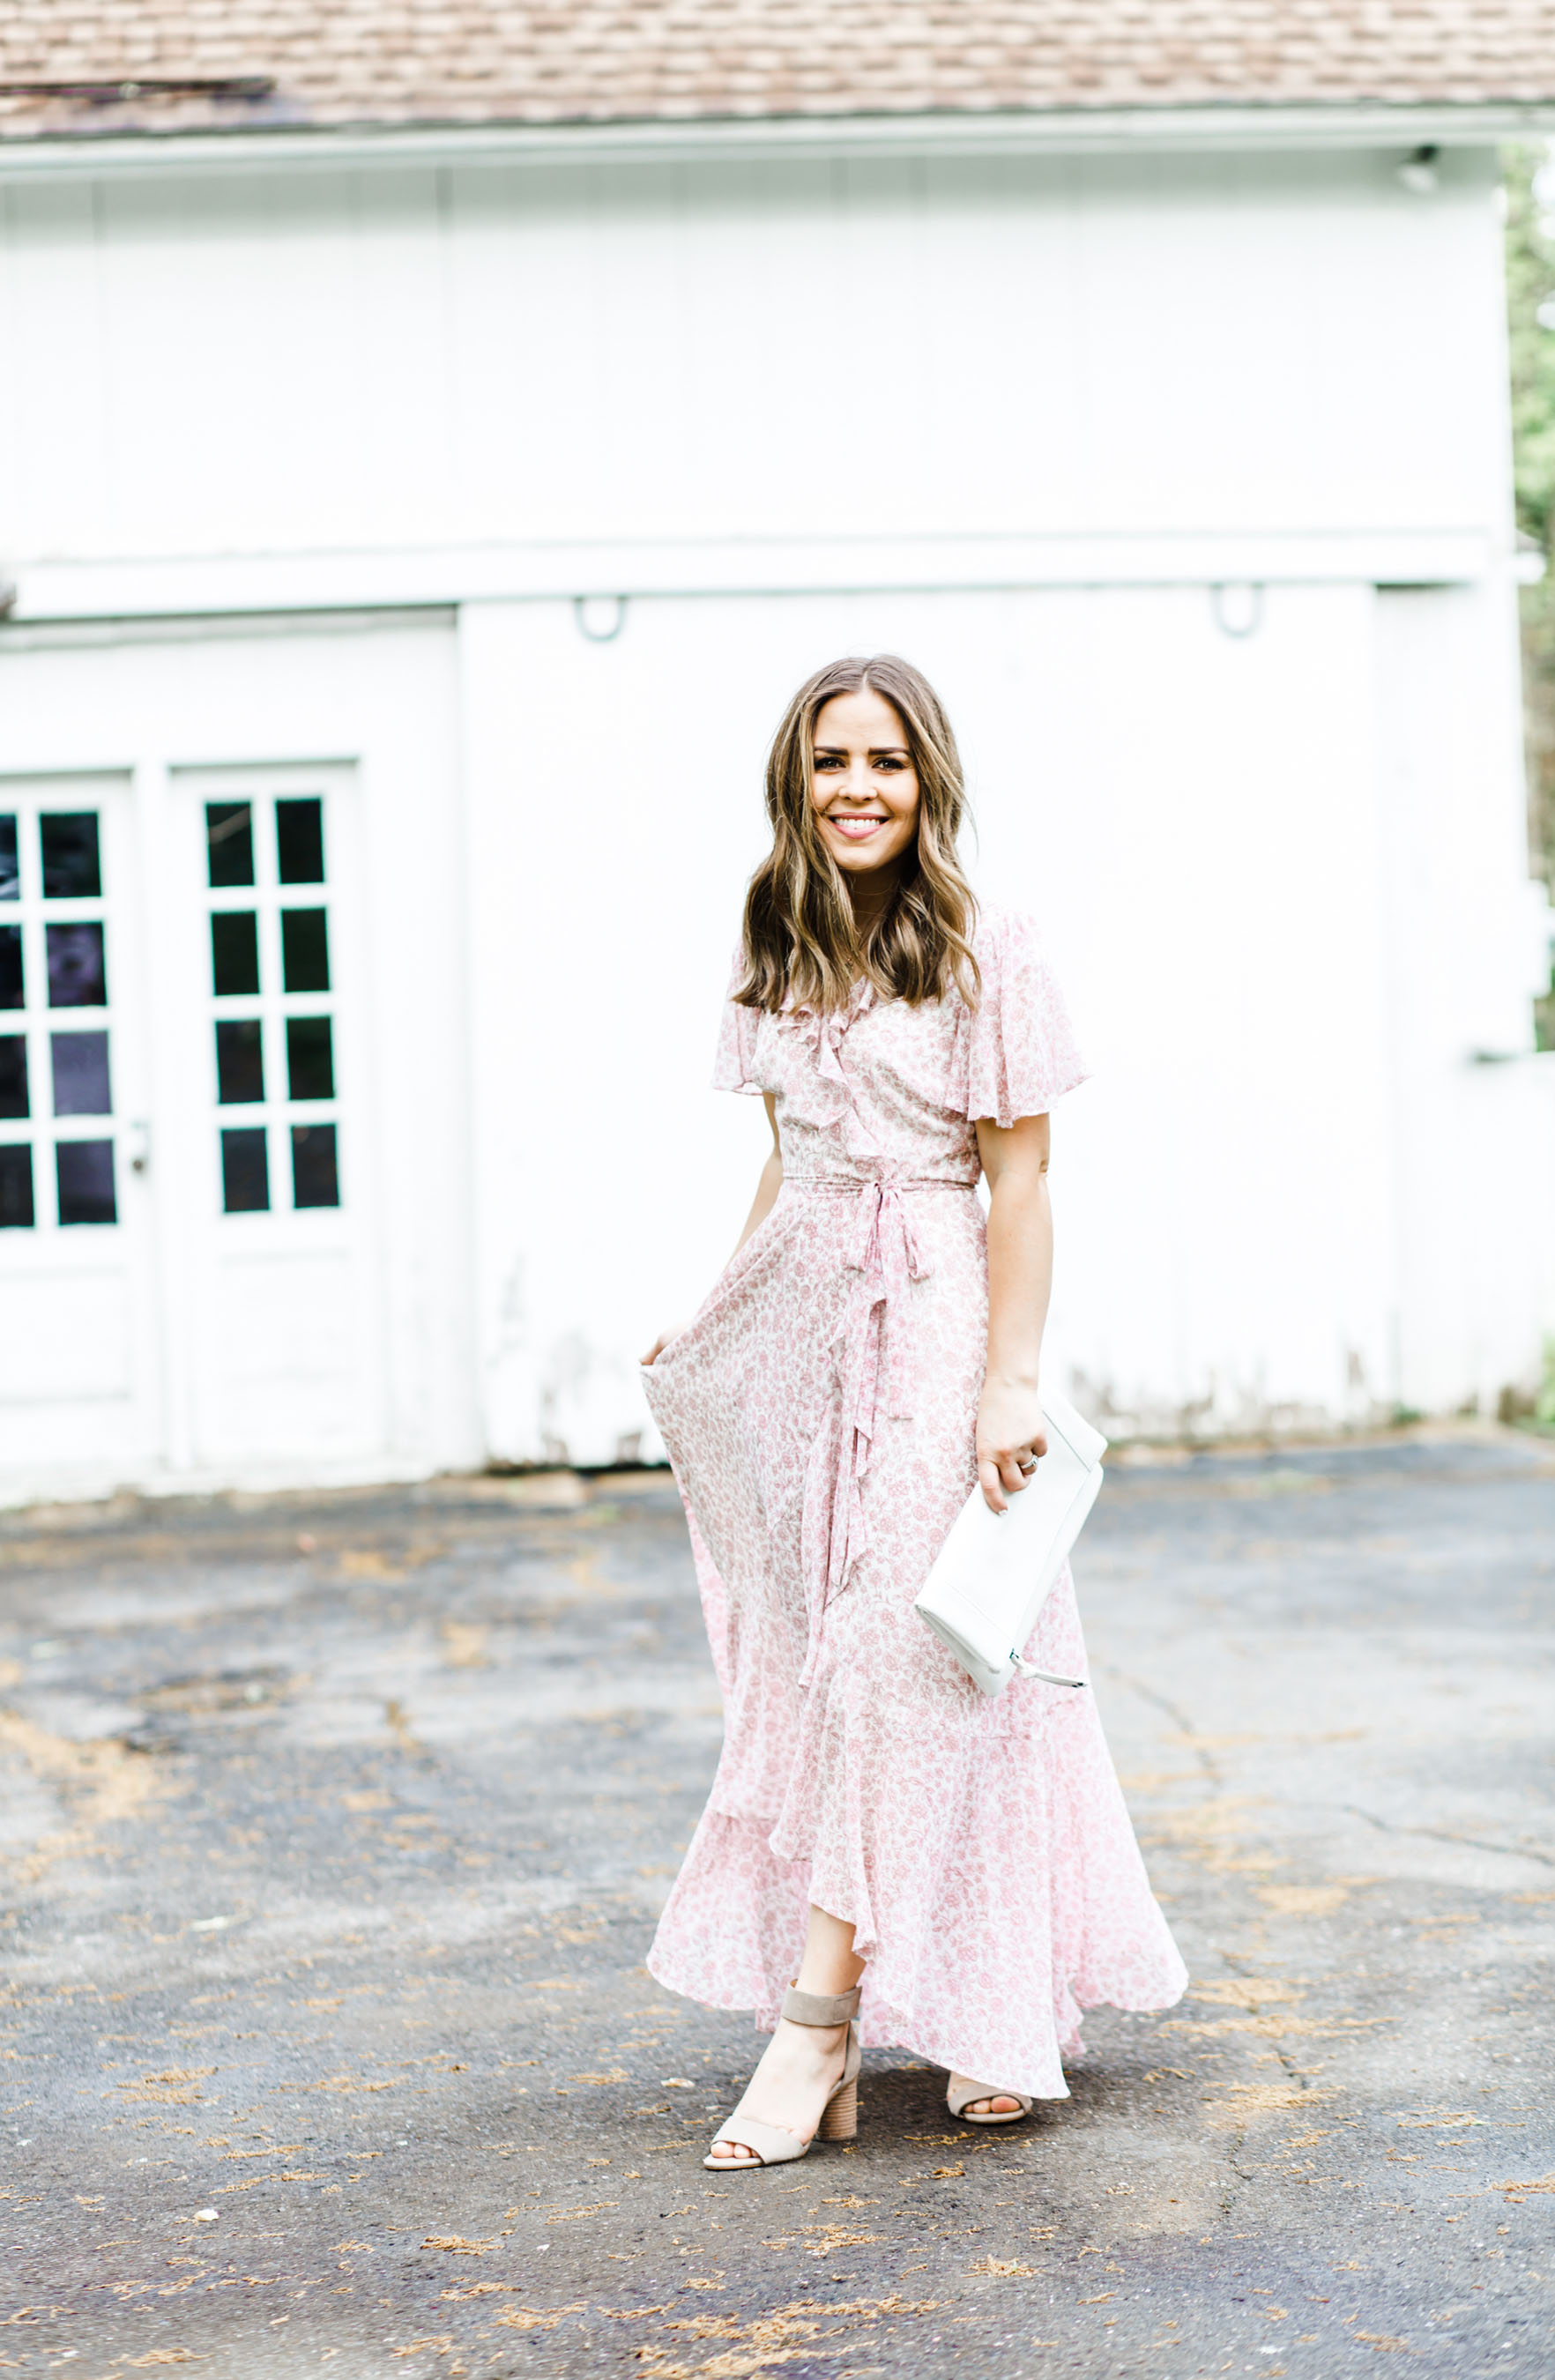 The Prettiest Wedding Guest Dresses And What Not To Wear To A Summer Wedding Dress Cori Lynn,Wedding Beautiful Night Dress